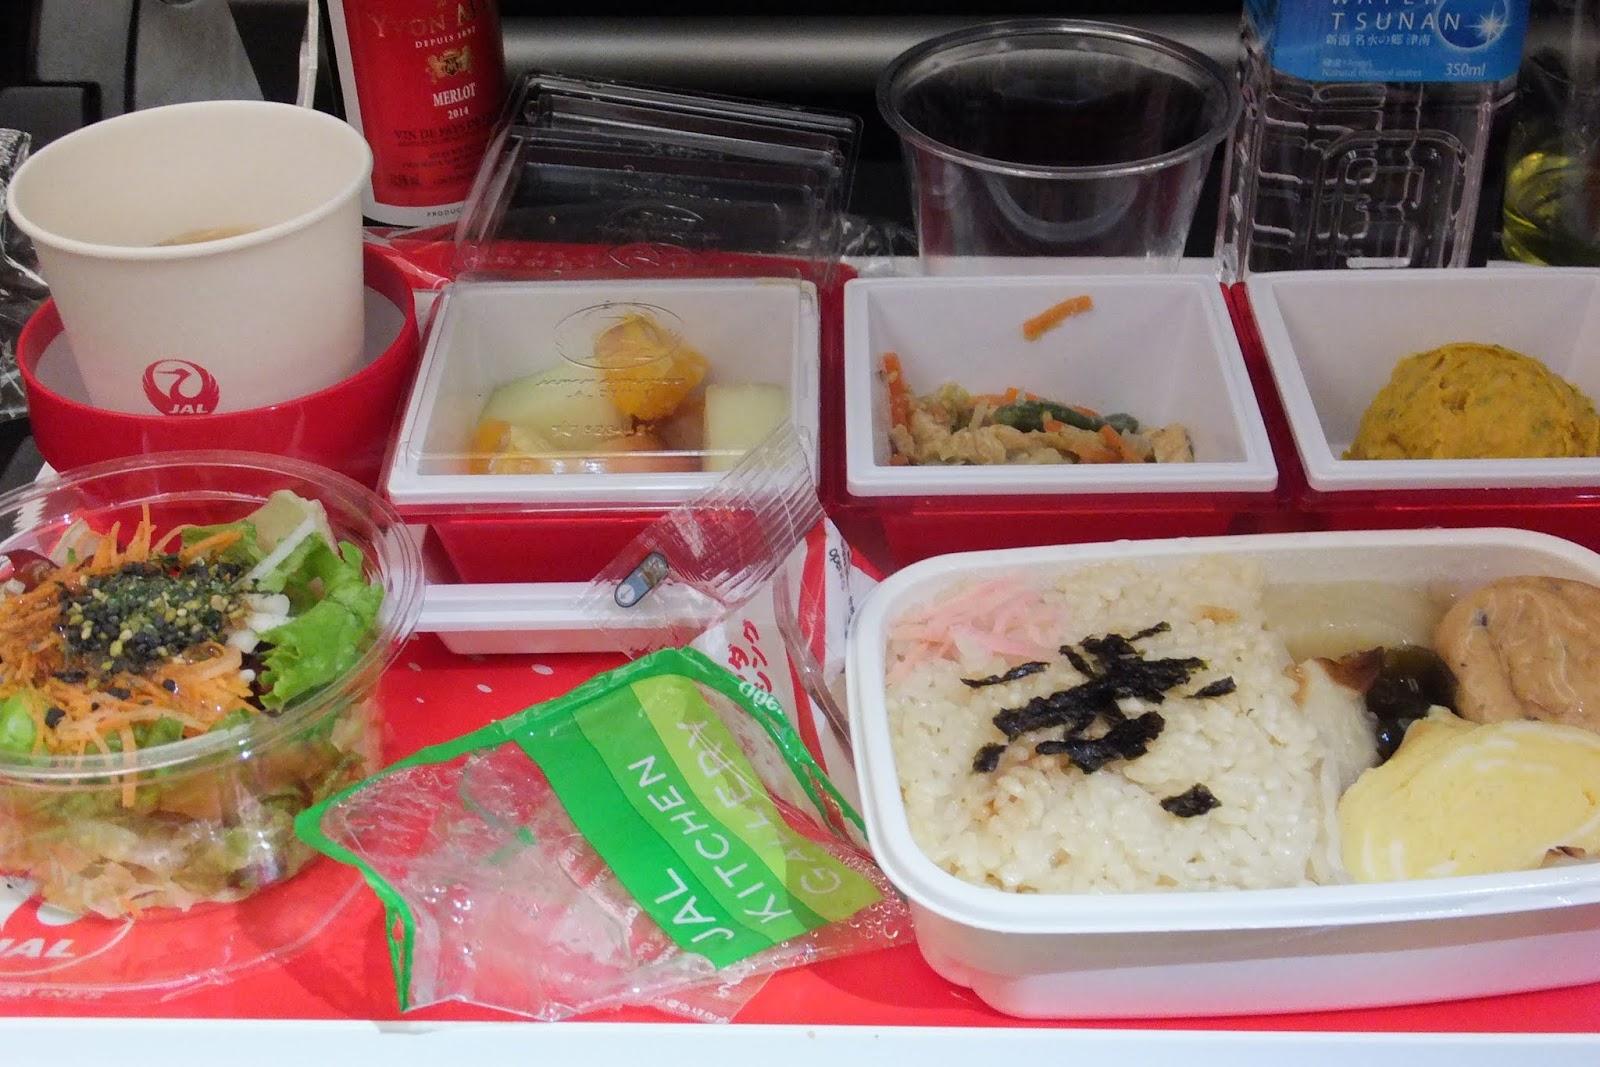 jal-economy-flightmeal JALおでん機内食2